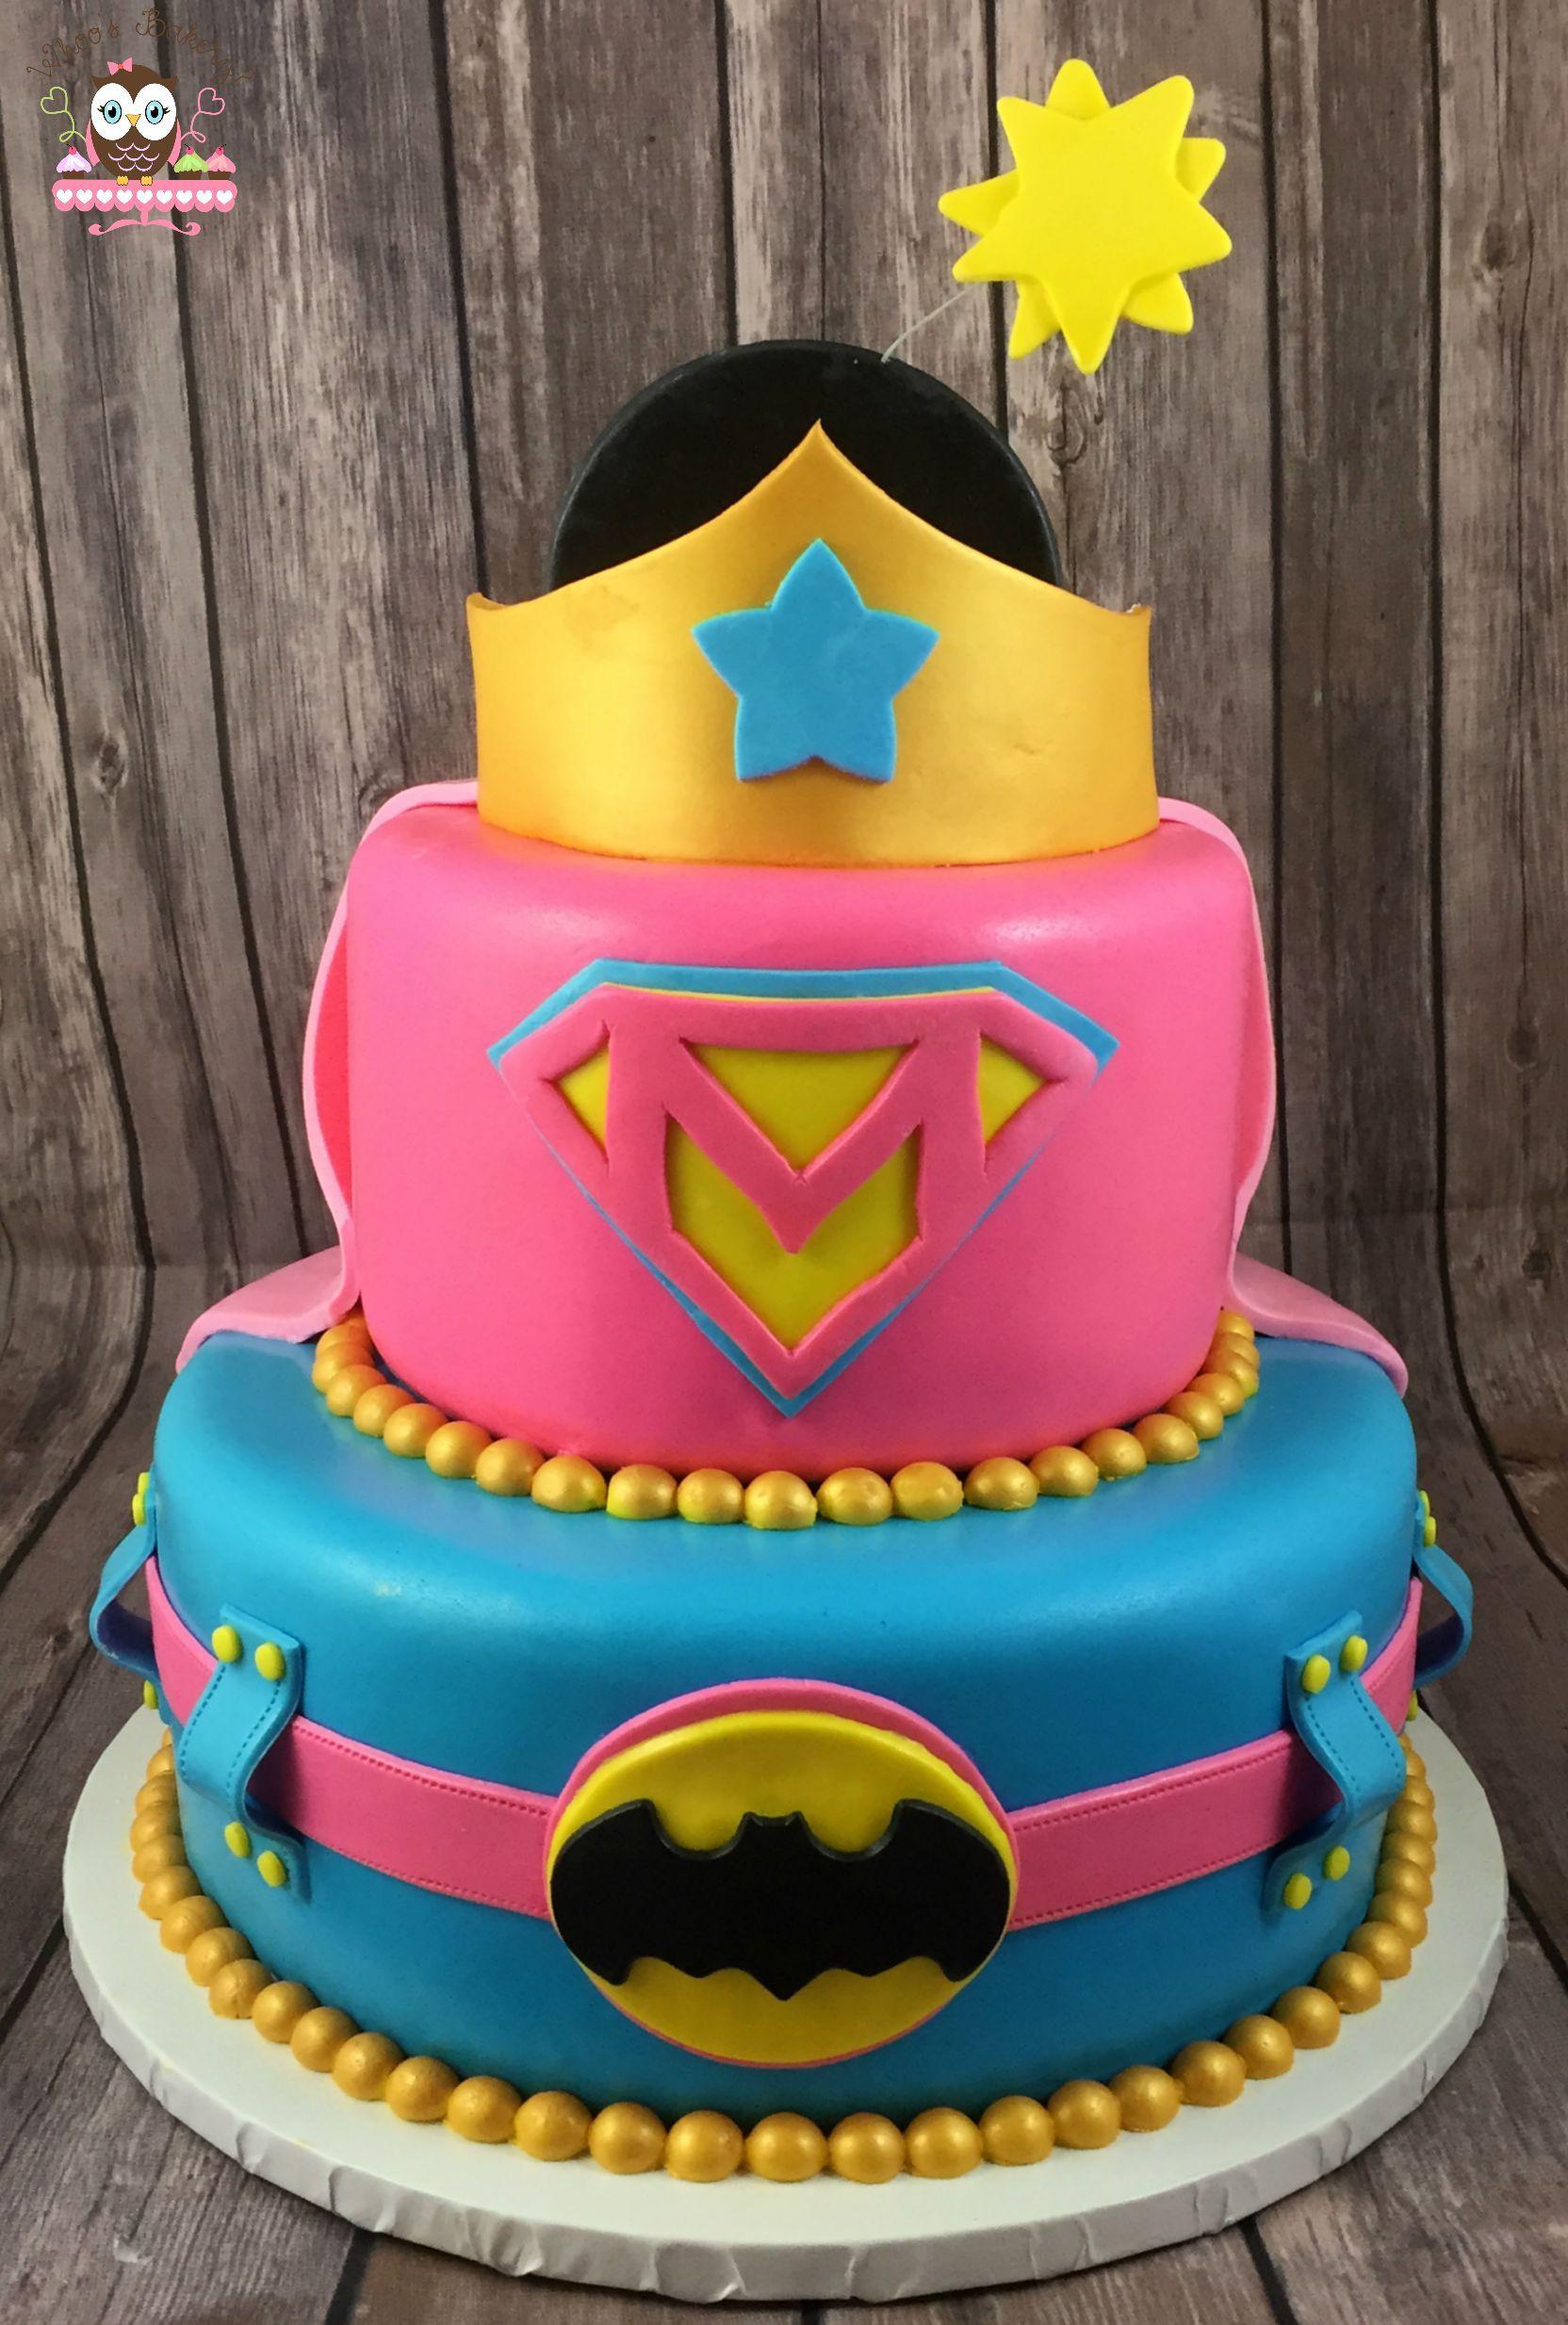 Superhero Birthday Cake  Superhero cake Girl Superhero Cake Pink superhero